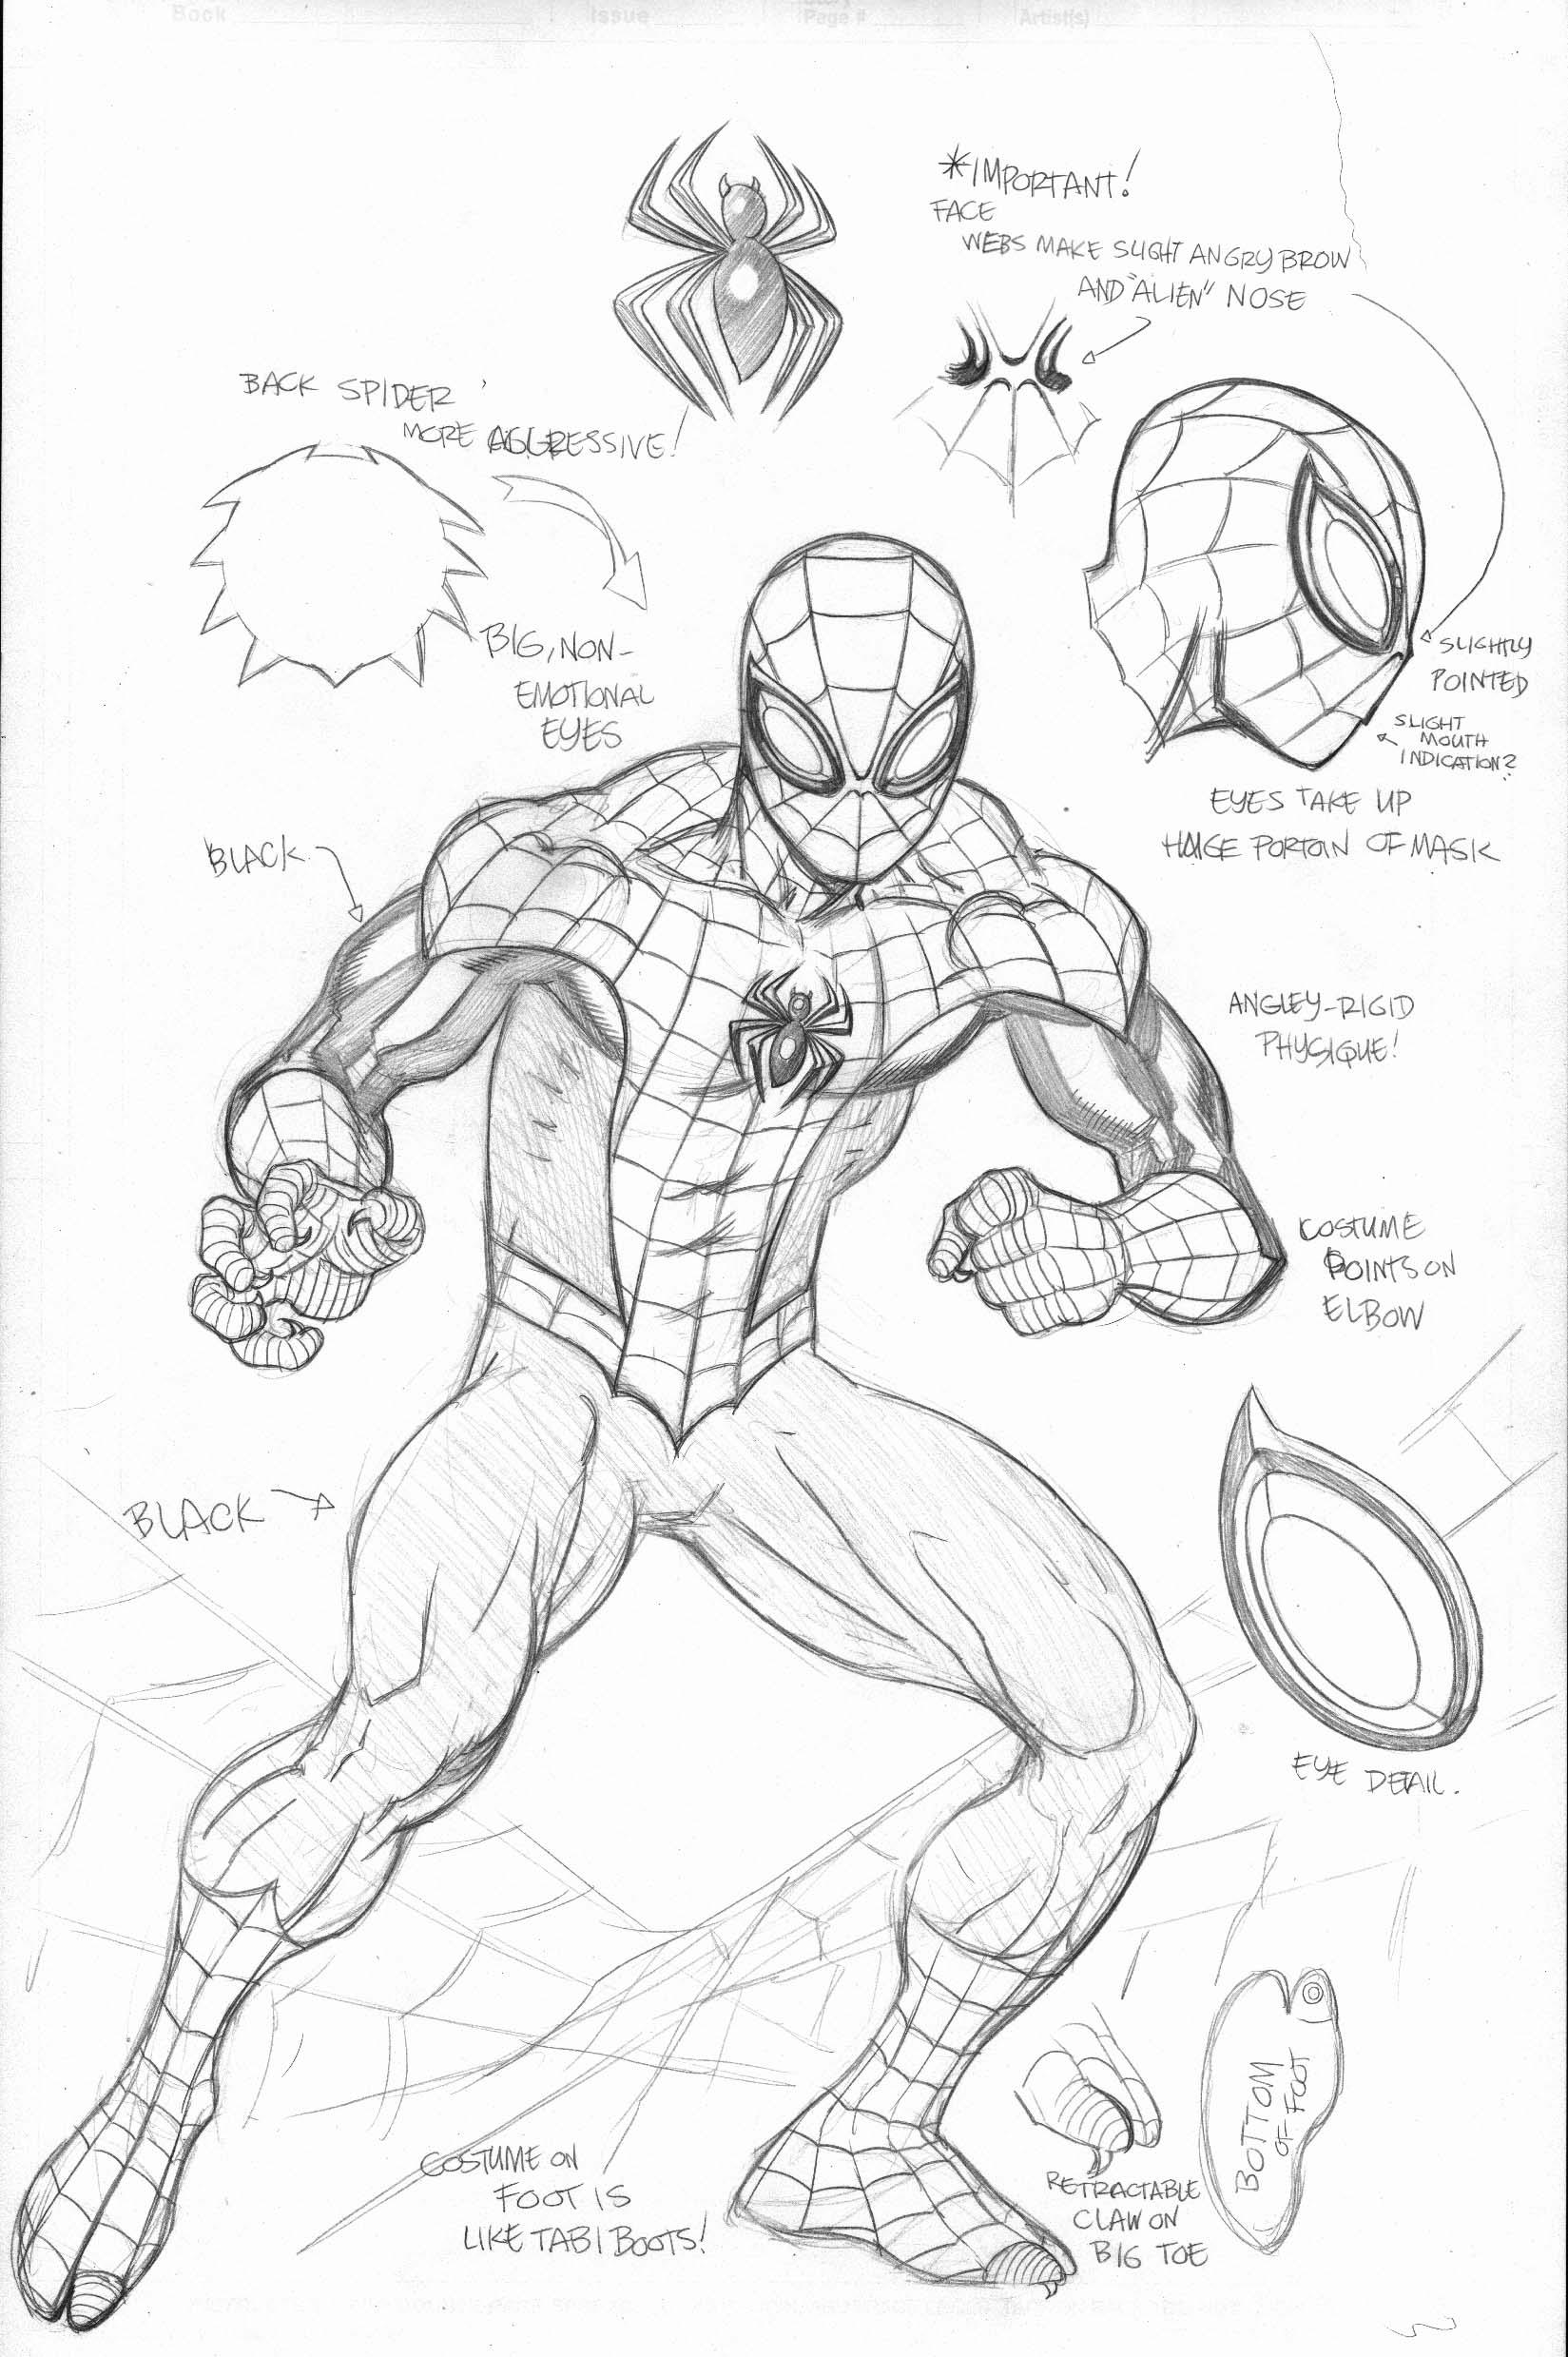 Superior Spiderman comics